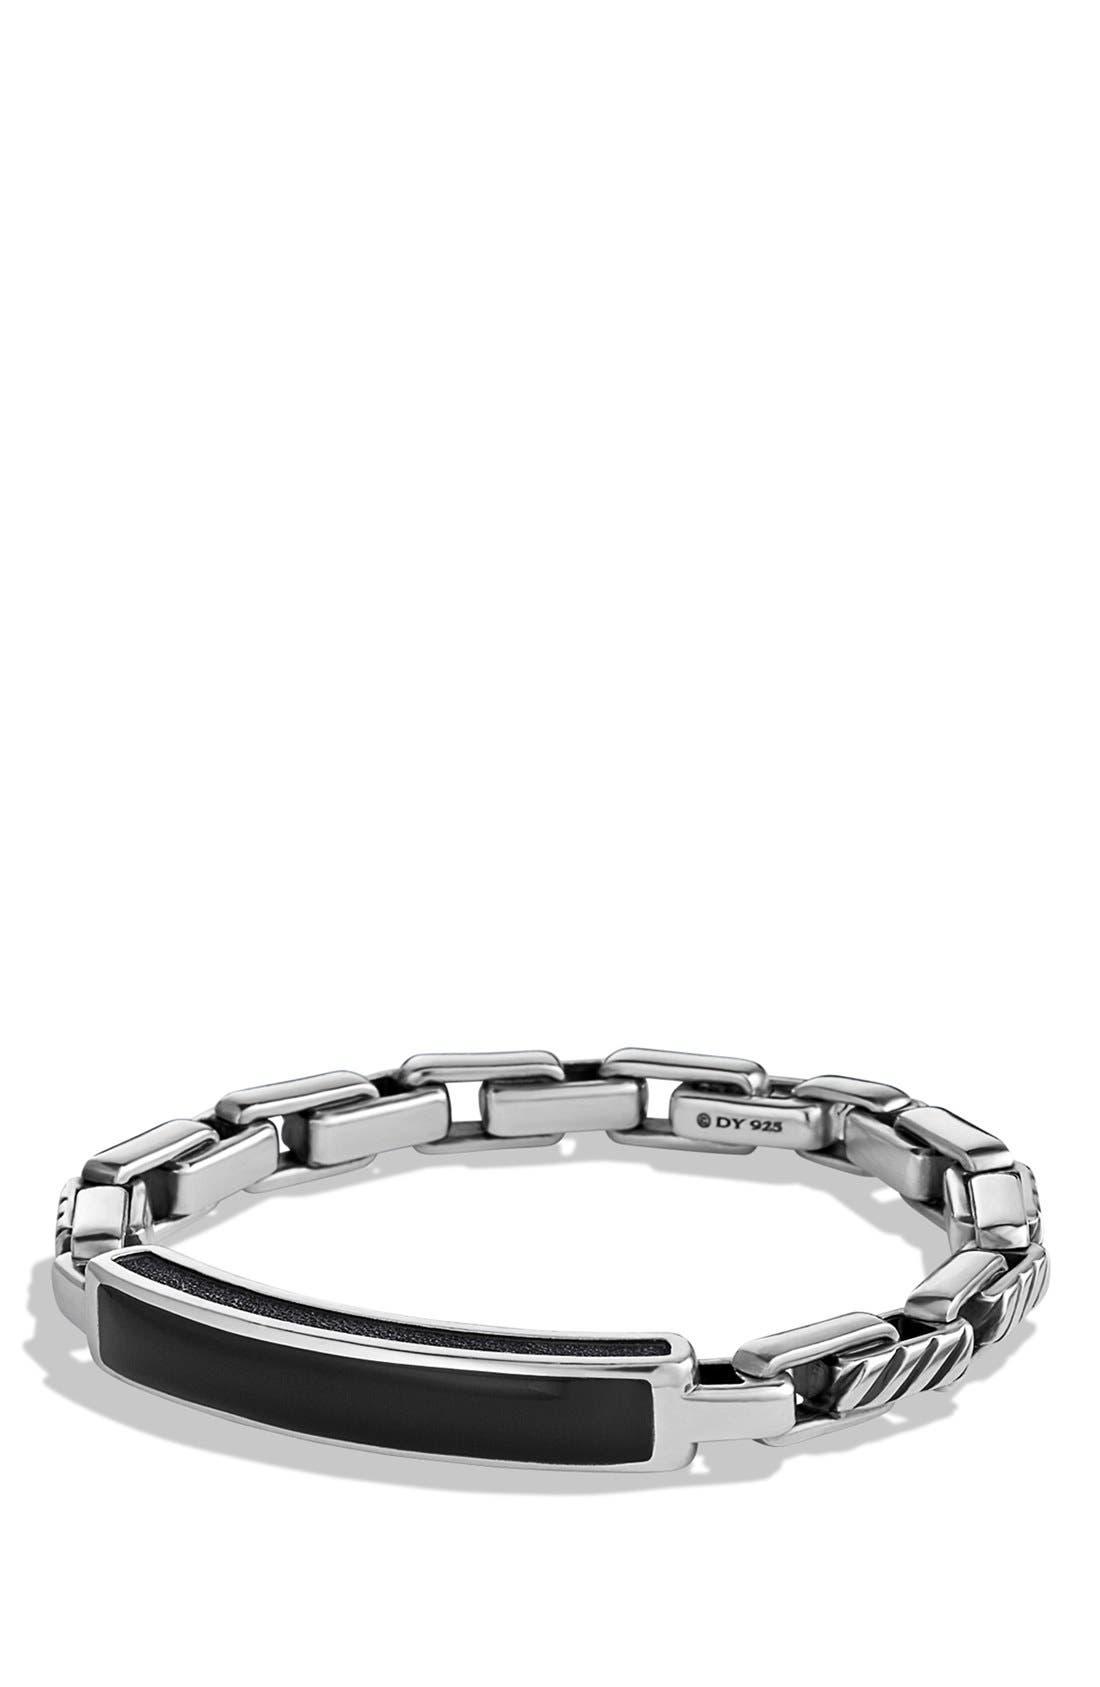 ' Modern Cable' ID Bracelet,                             Main thumbnail 1, color,                             001